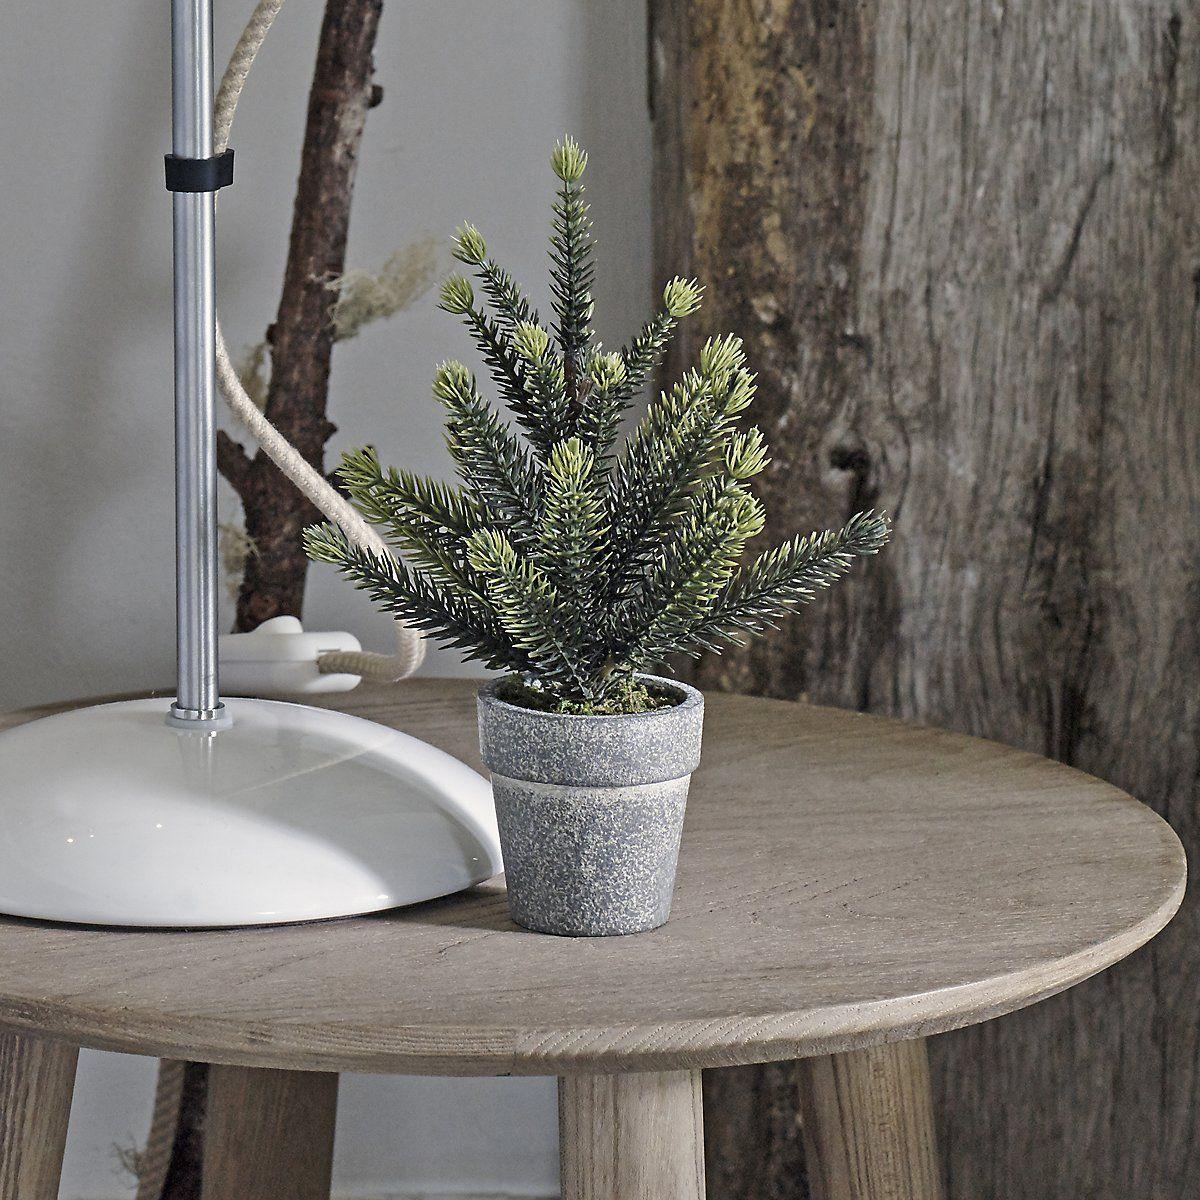 Mini Potted Spruce - Set of 2 | The White Company UK